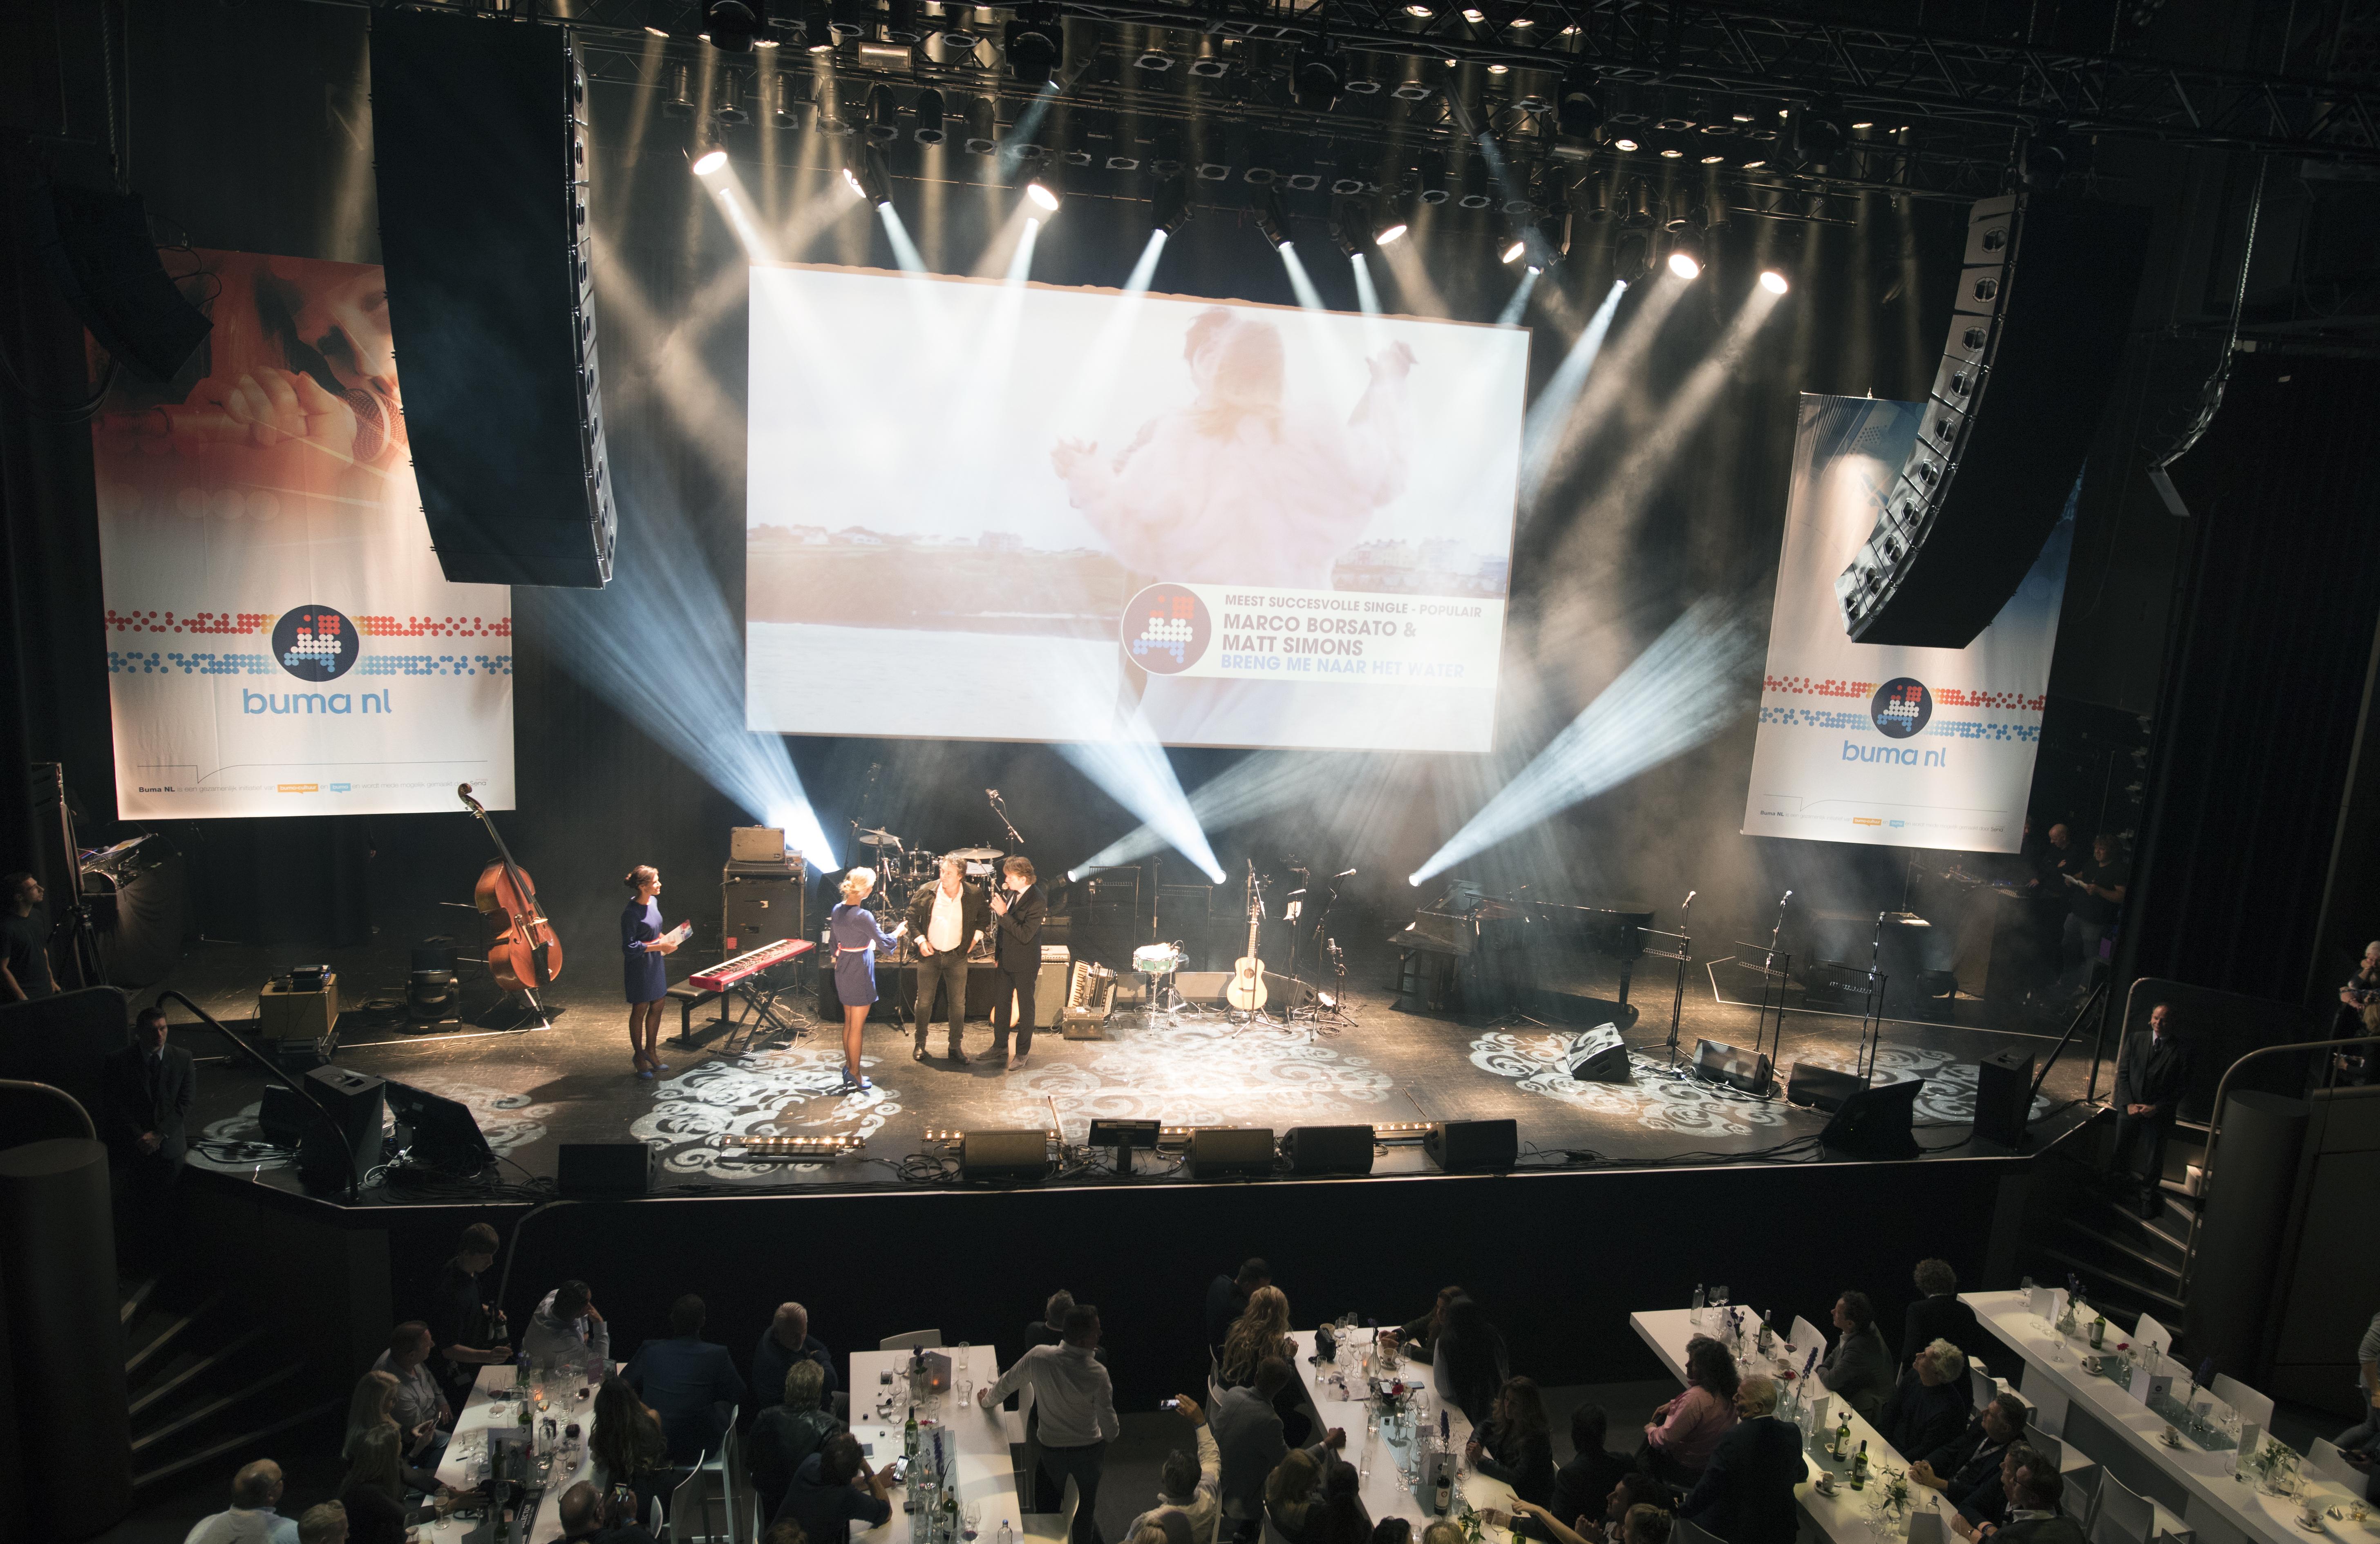 Marco Borsato en Matt Simons tijdens Buma NL Awards 2017 - Fotocredits: Shali Blok (ArtiestenNieuws)